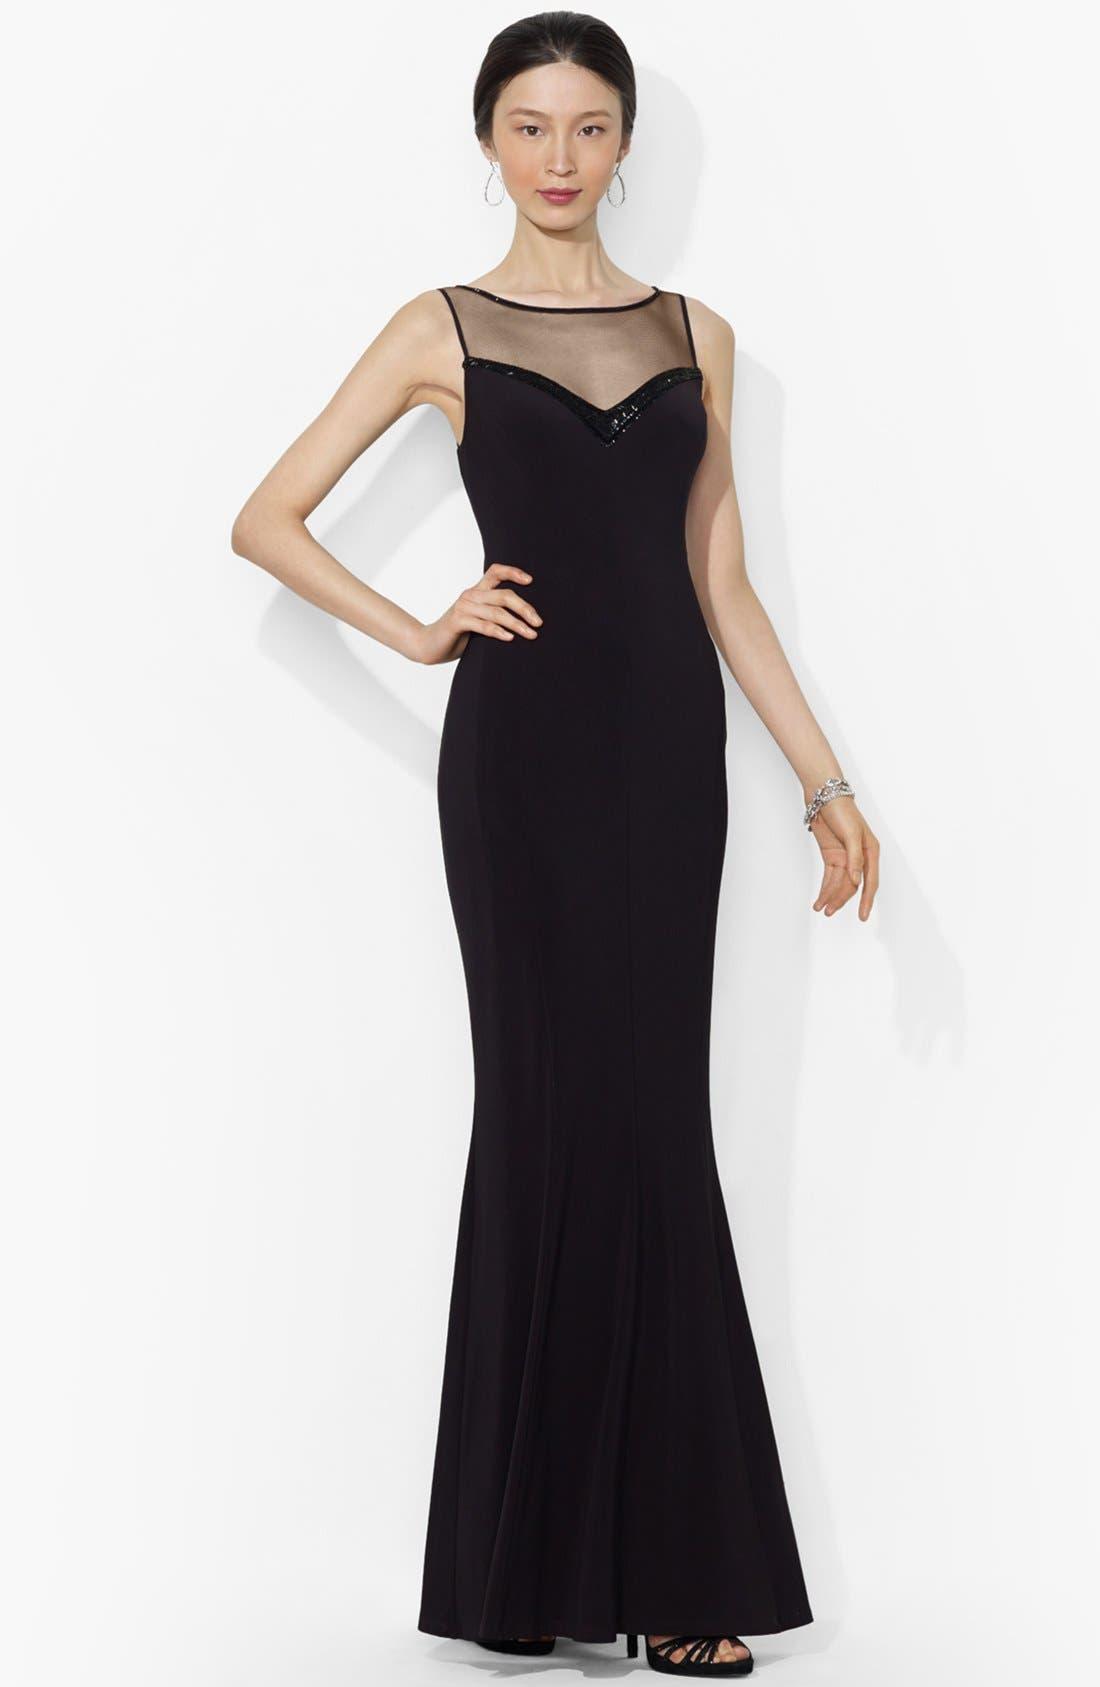 Alternate Image 1 Selected - Lauren Ralph Lauren Embellished Yoke Mermaid Gown (Regular & Petite)